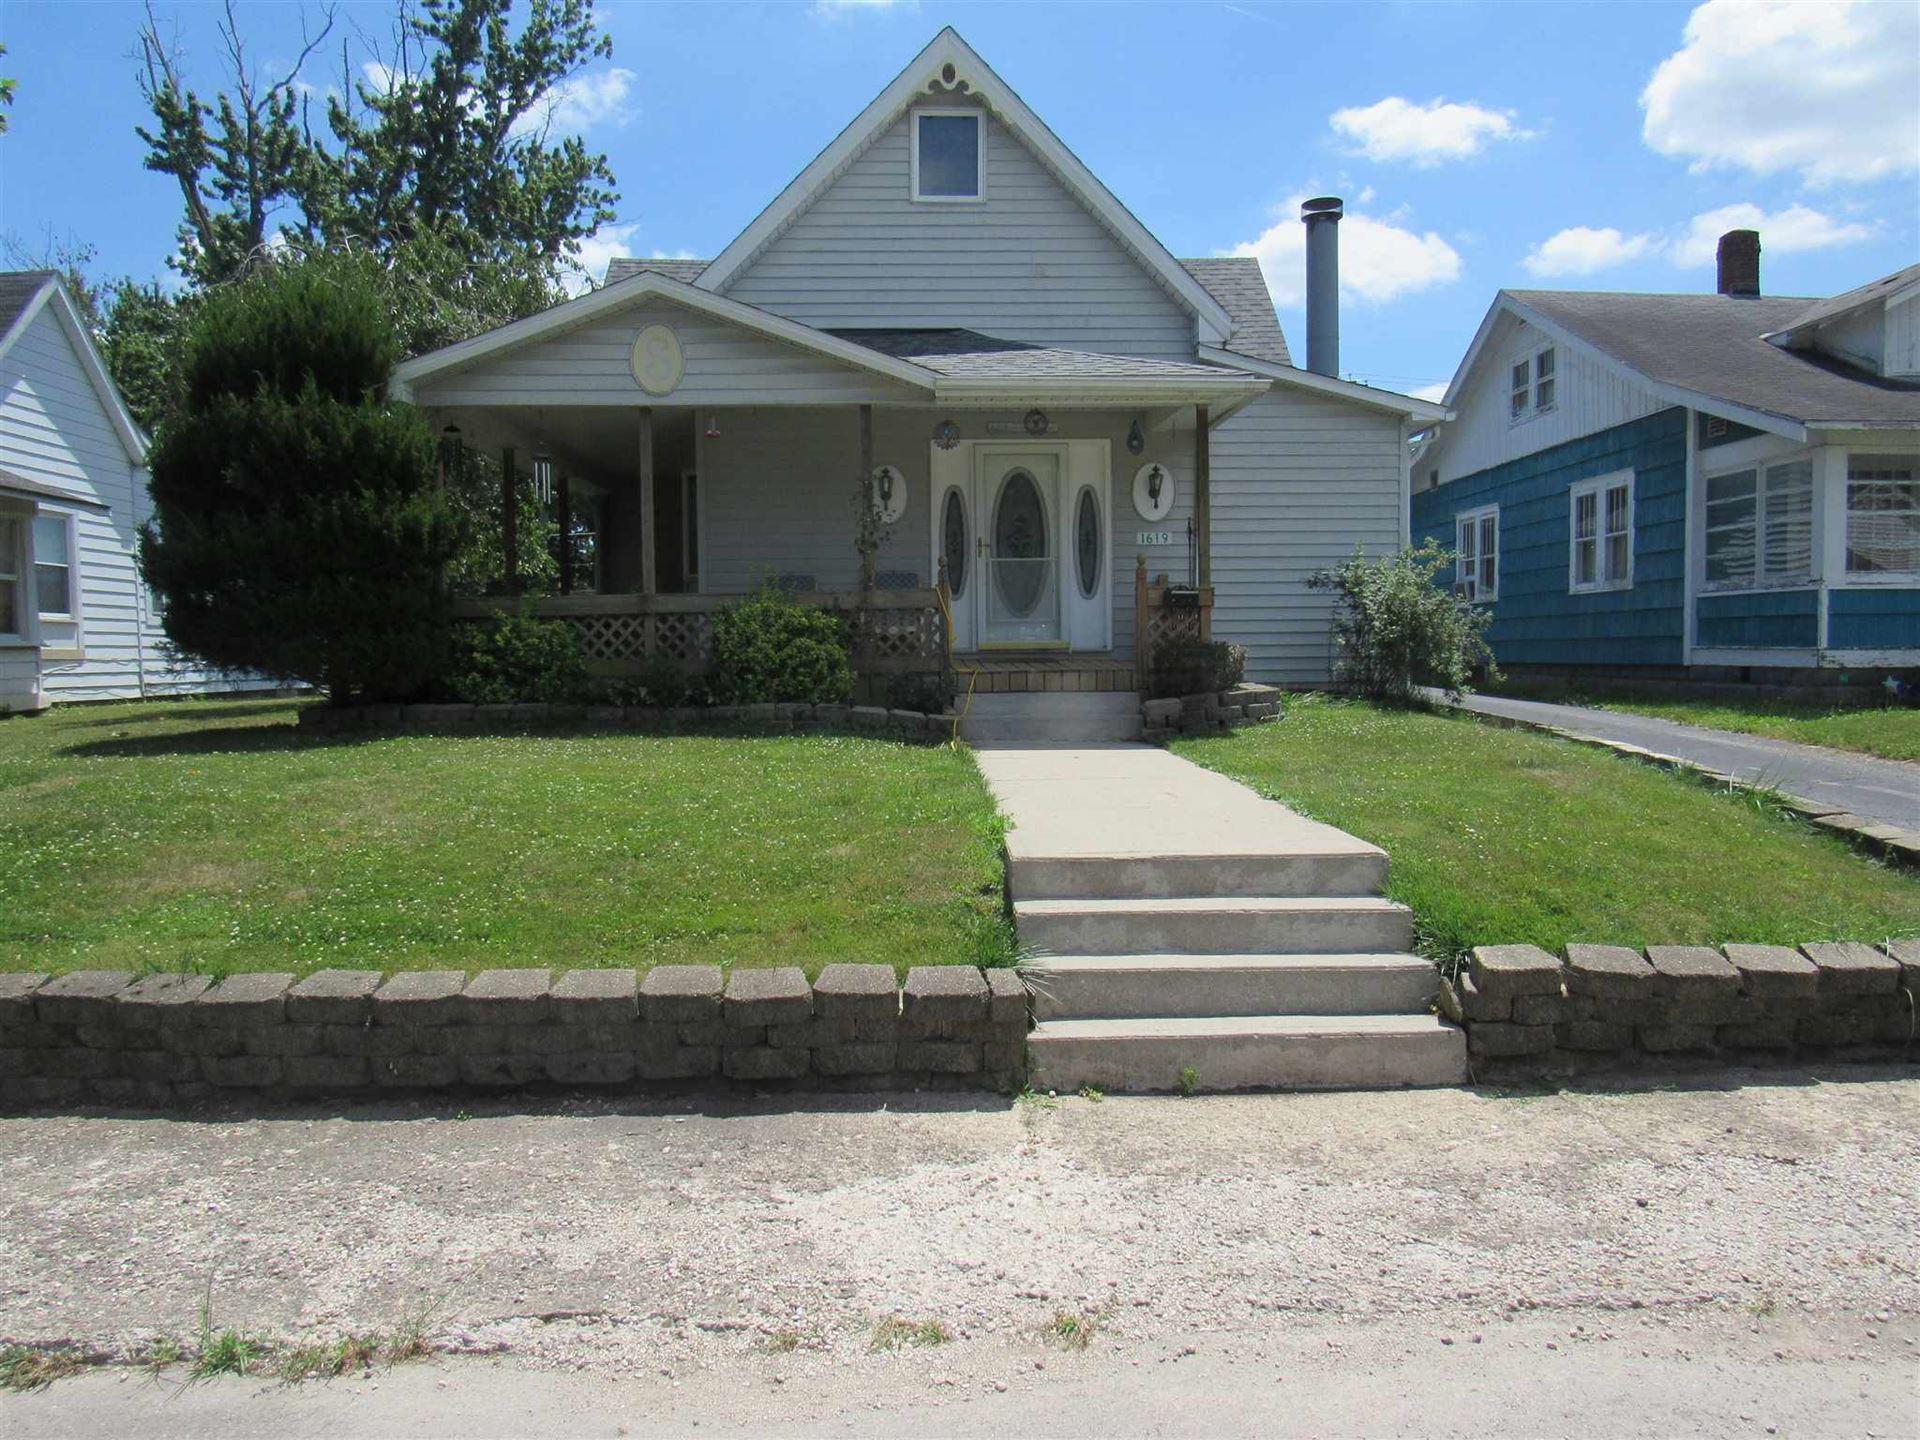 1619 S J Street, Elwood, IN 46036 - #: 202027381